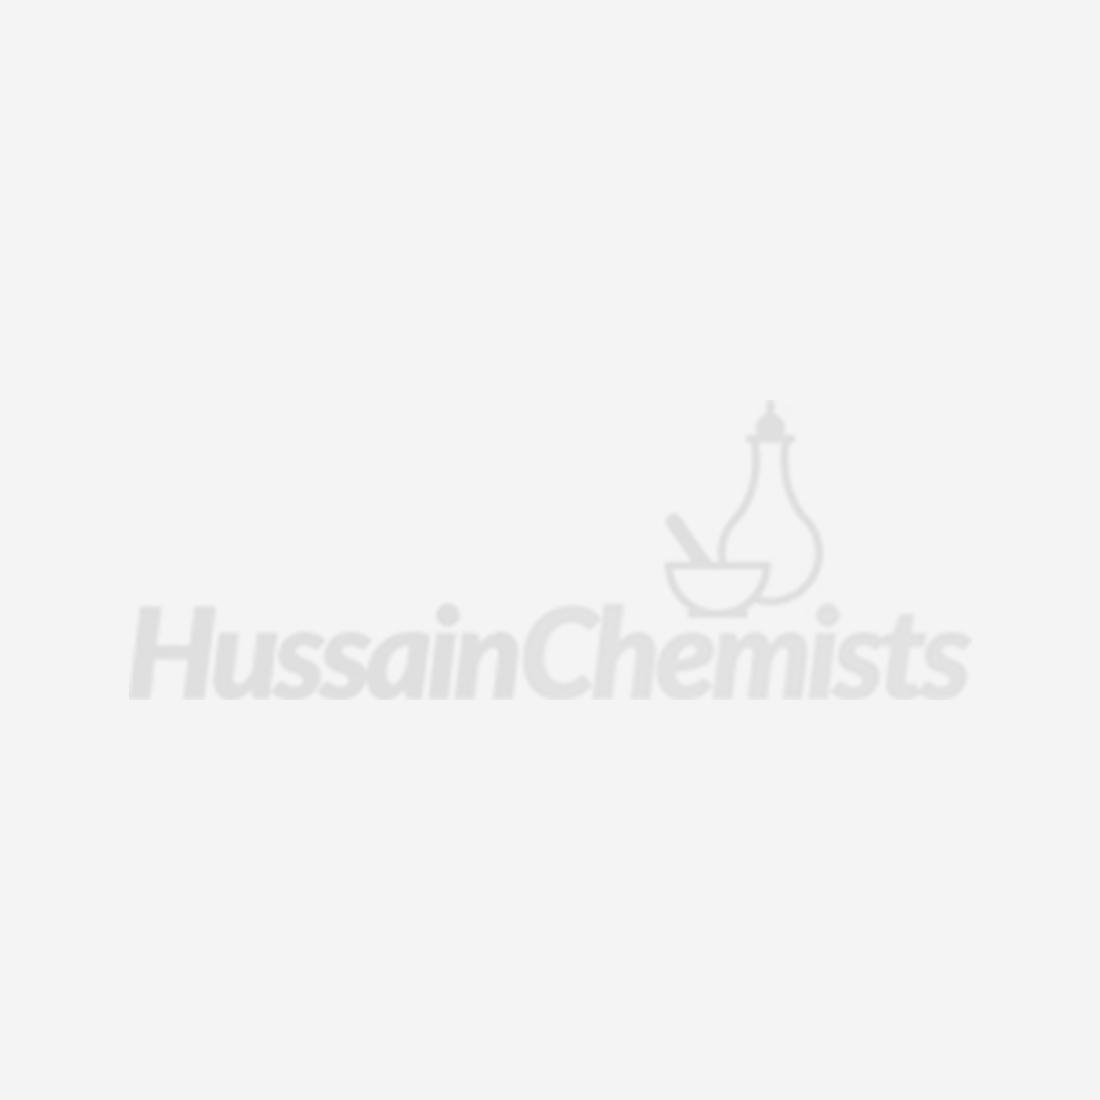 Difflam Sore Throat Rinse - 200ml